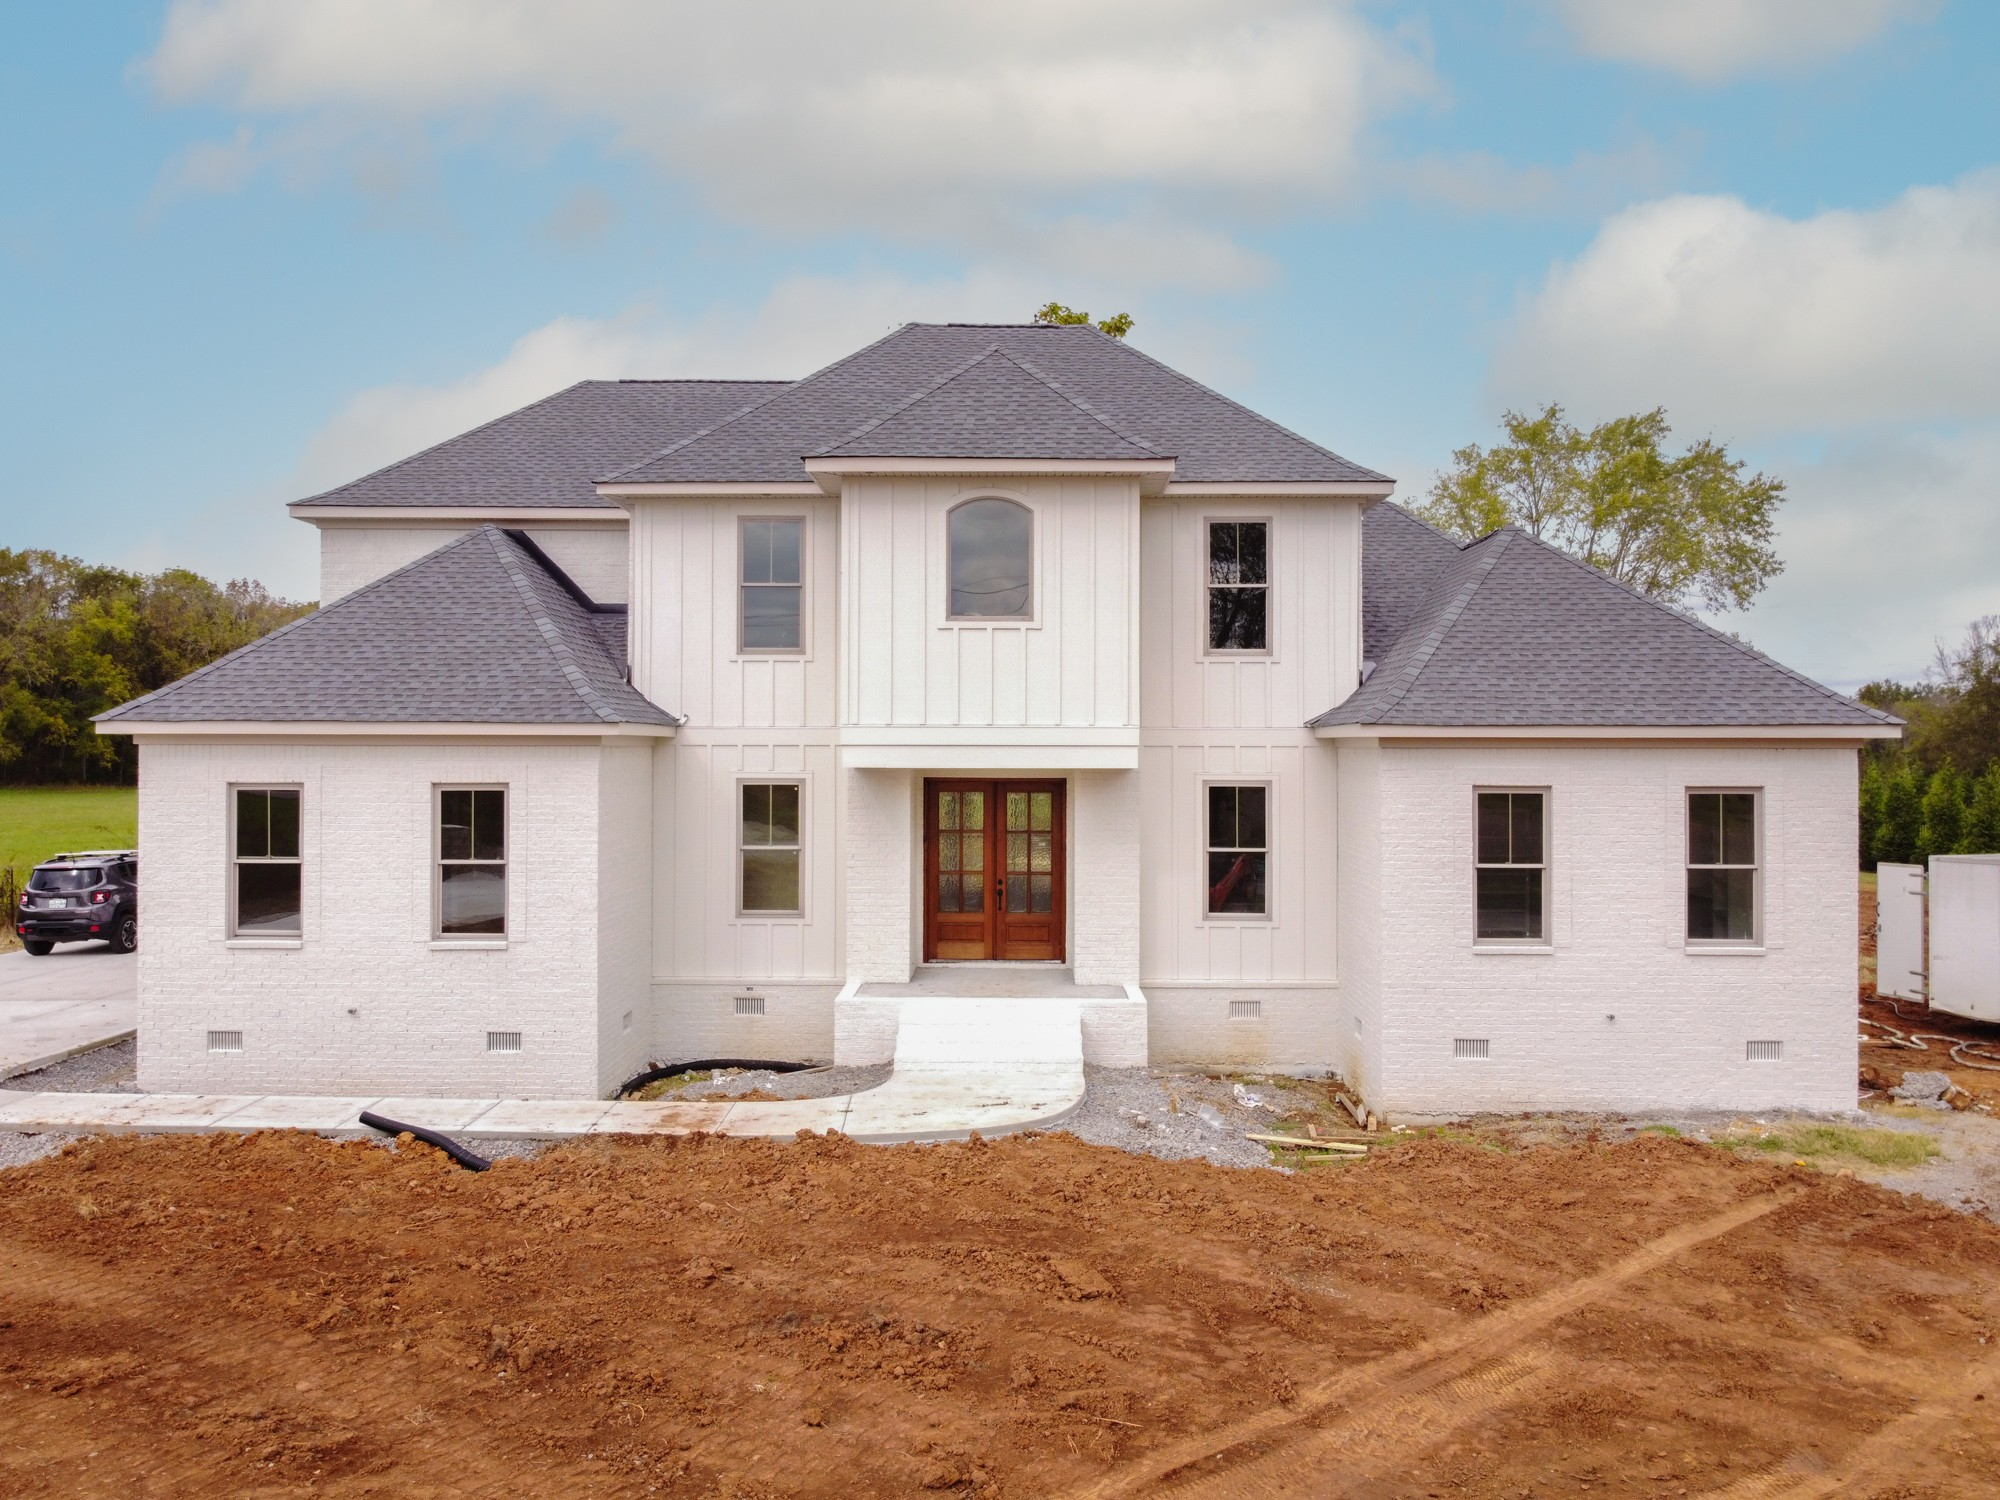 2070 Swamp Leanna Rd Property Photo 1